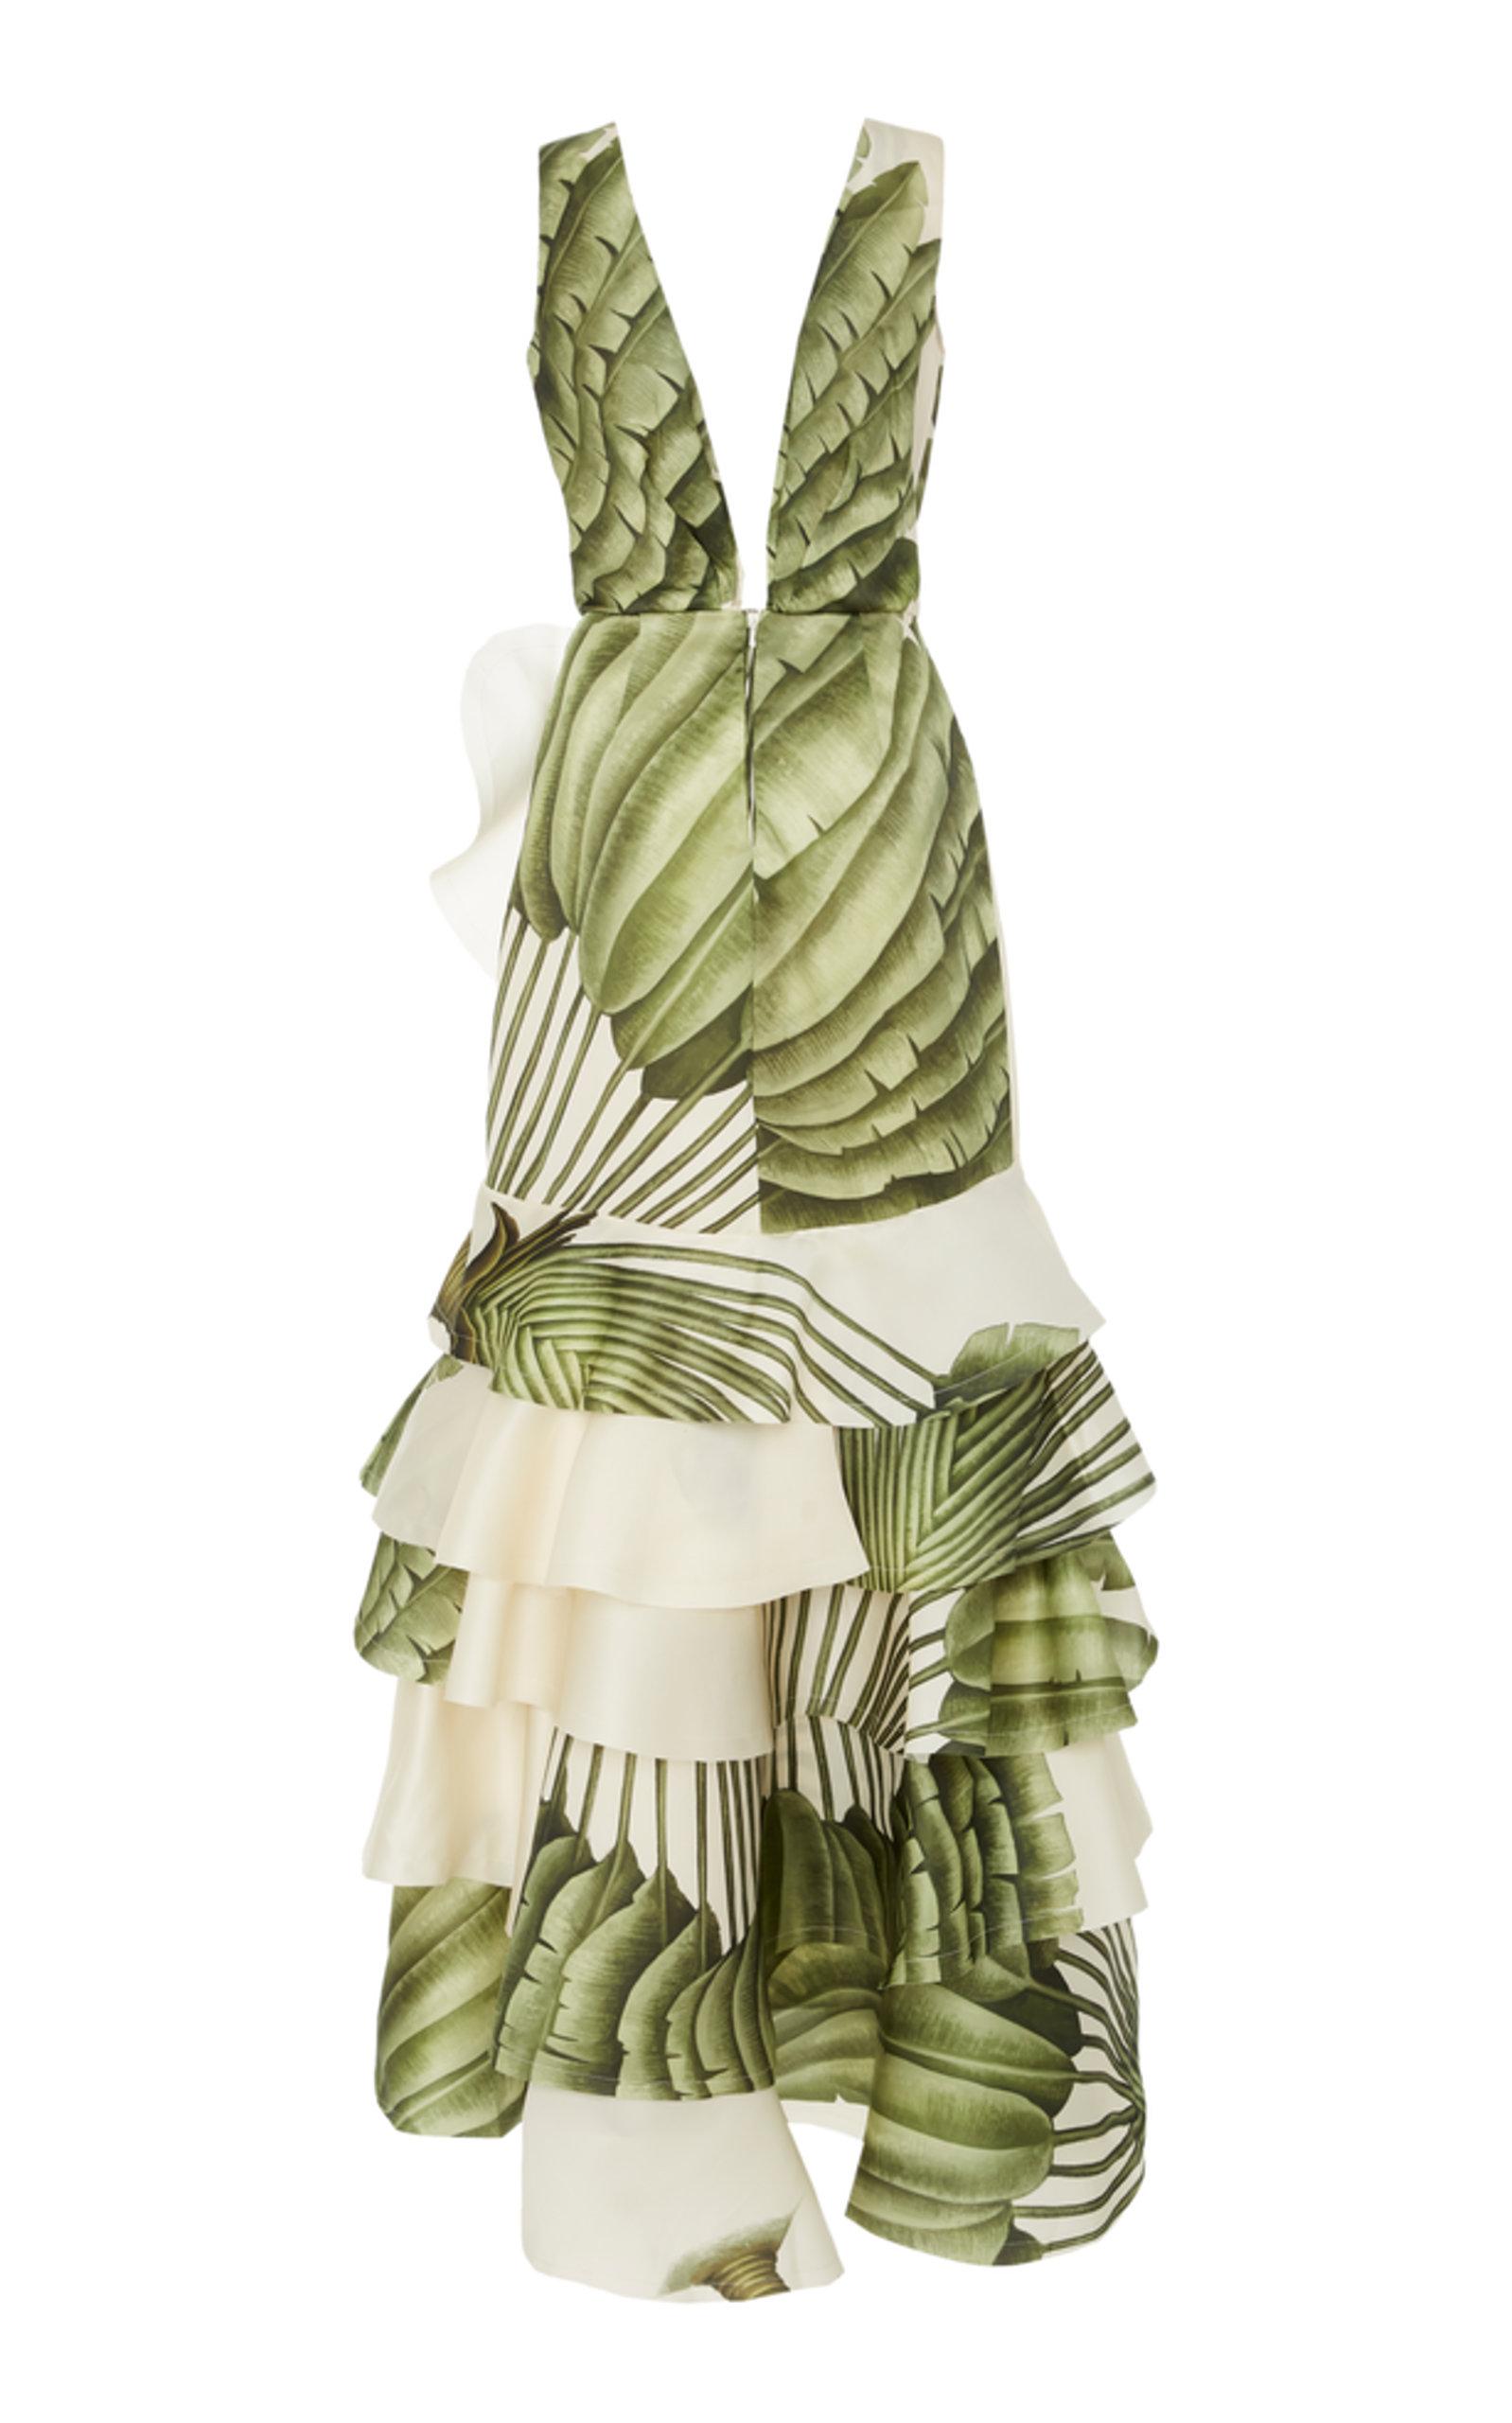 8e71aa80482 Johanna OrtizCoconut Palm Organza Dress. CLOSE. Loading. Loading